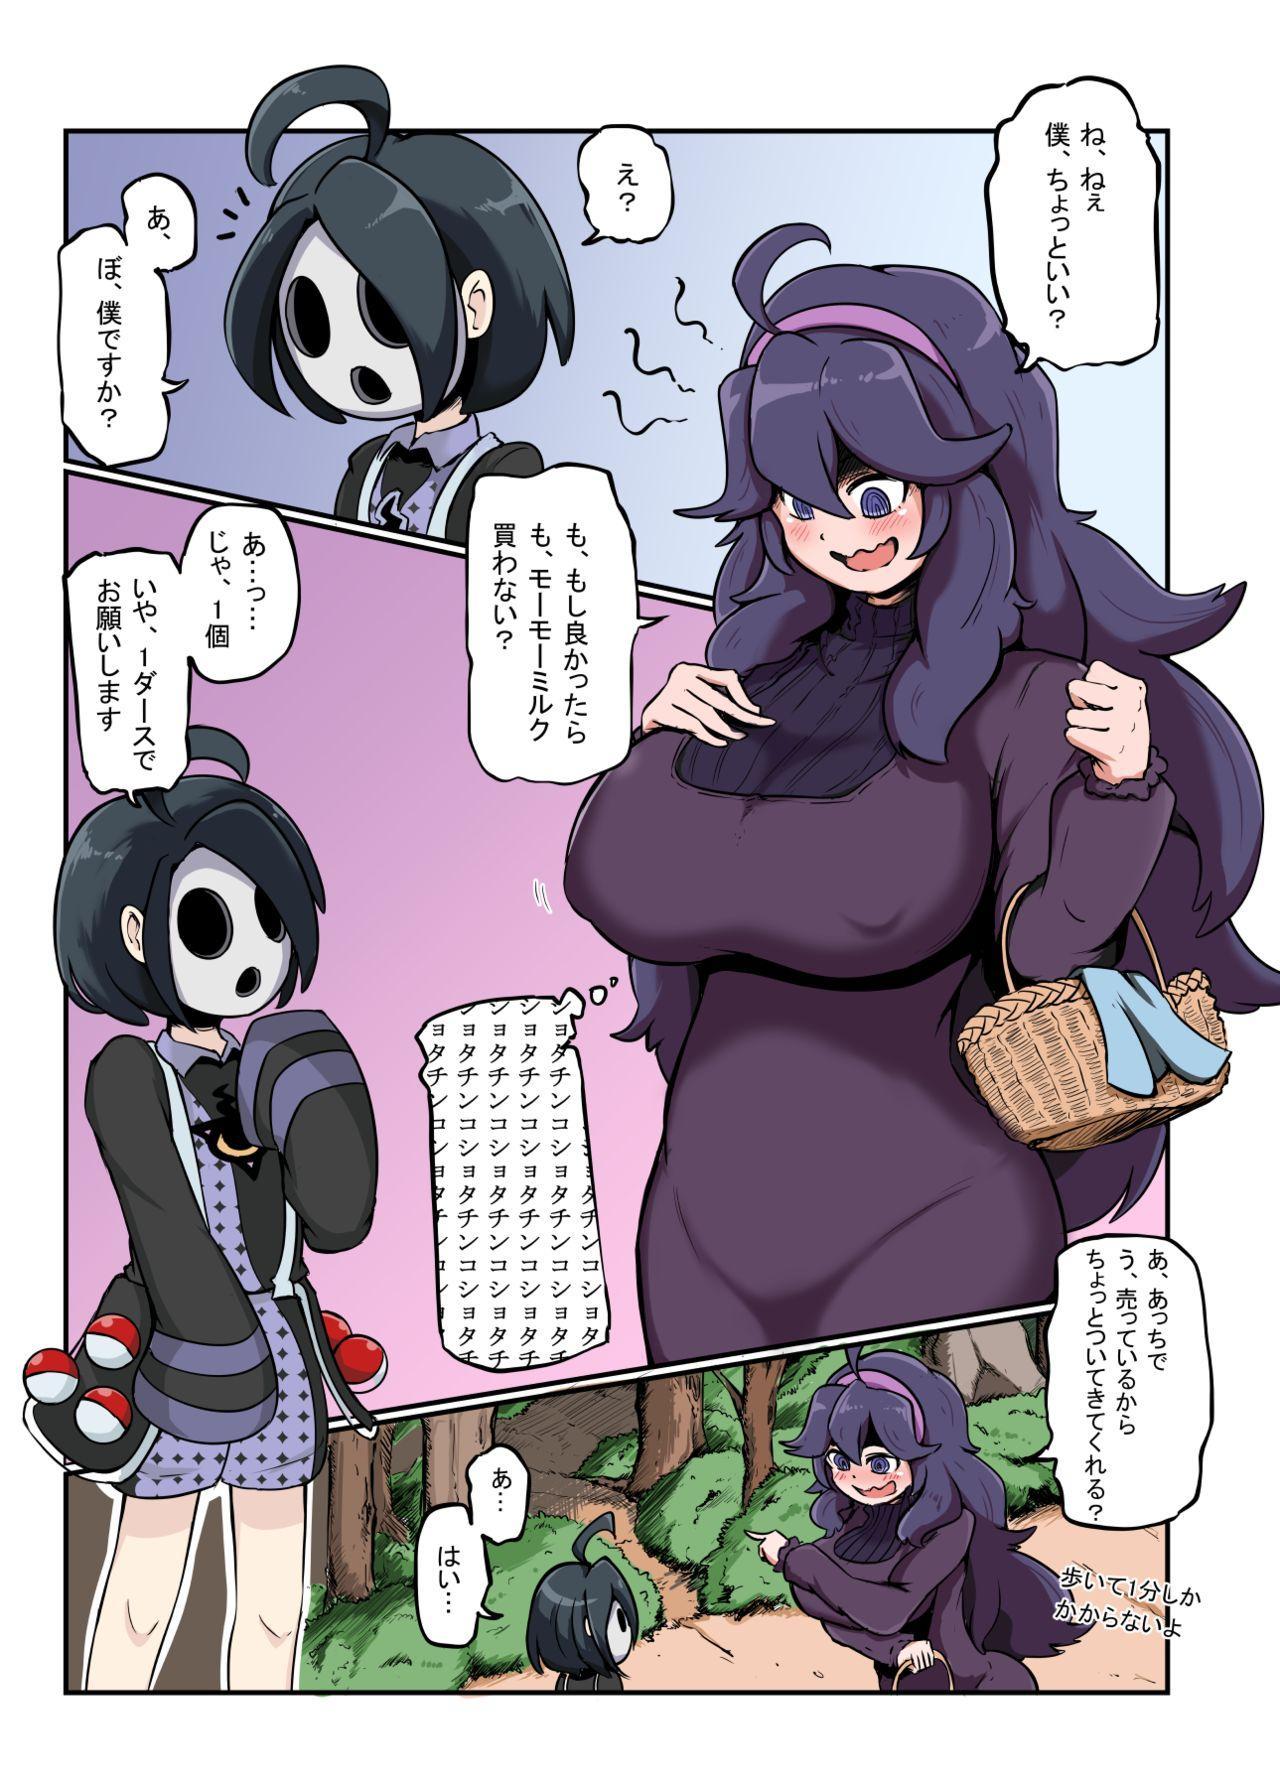 [DPg] Shota-gui Mania-chan (Pokémon) 0